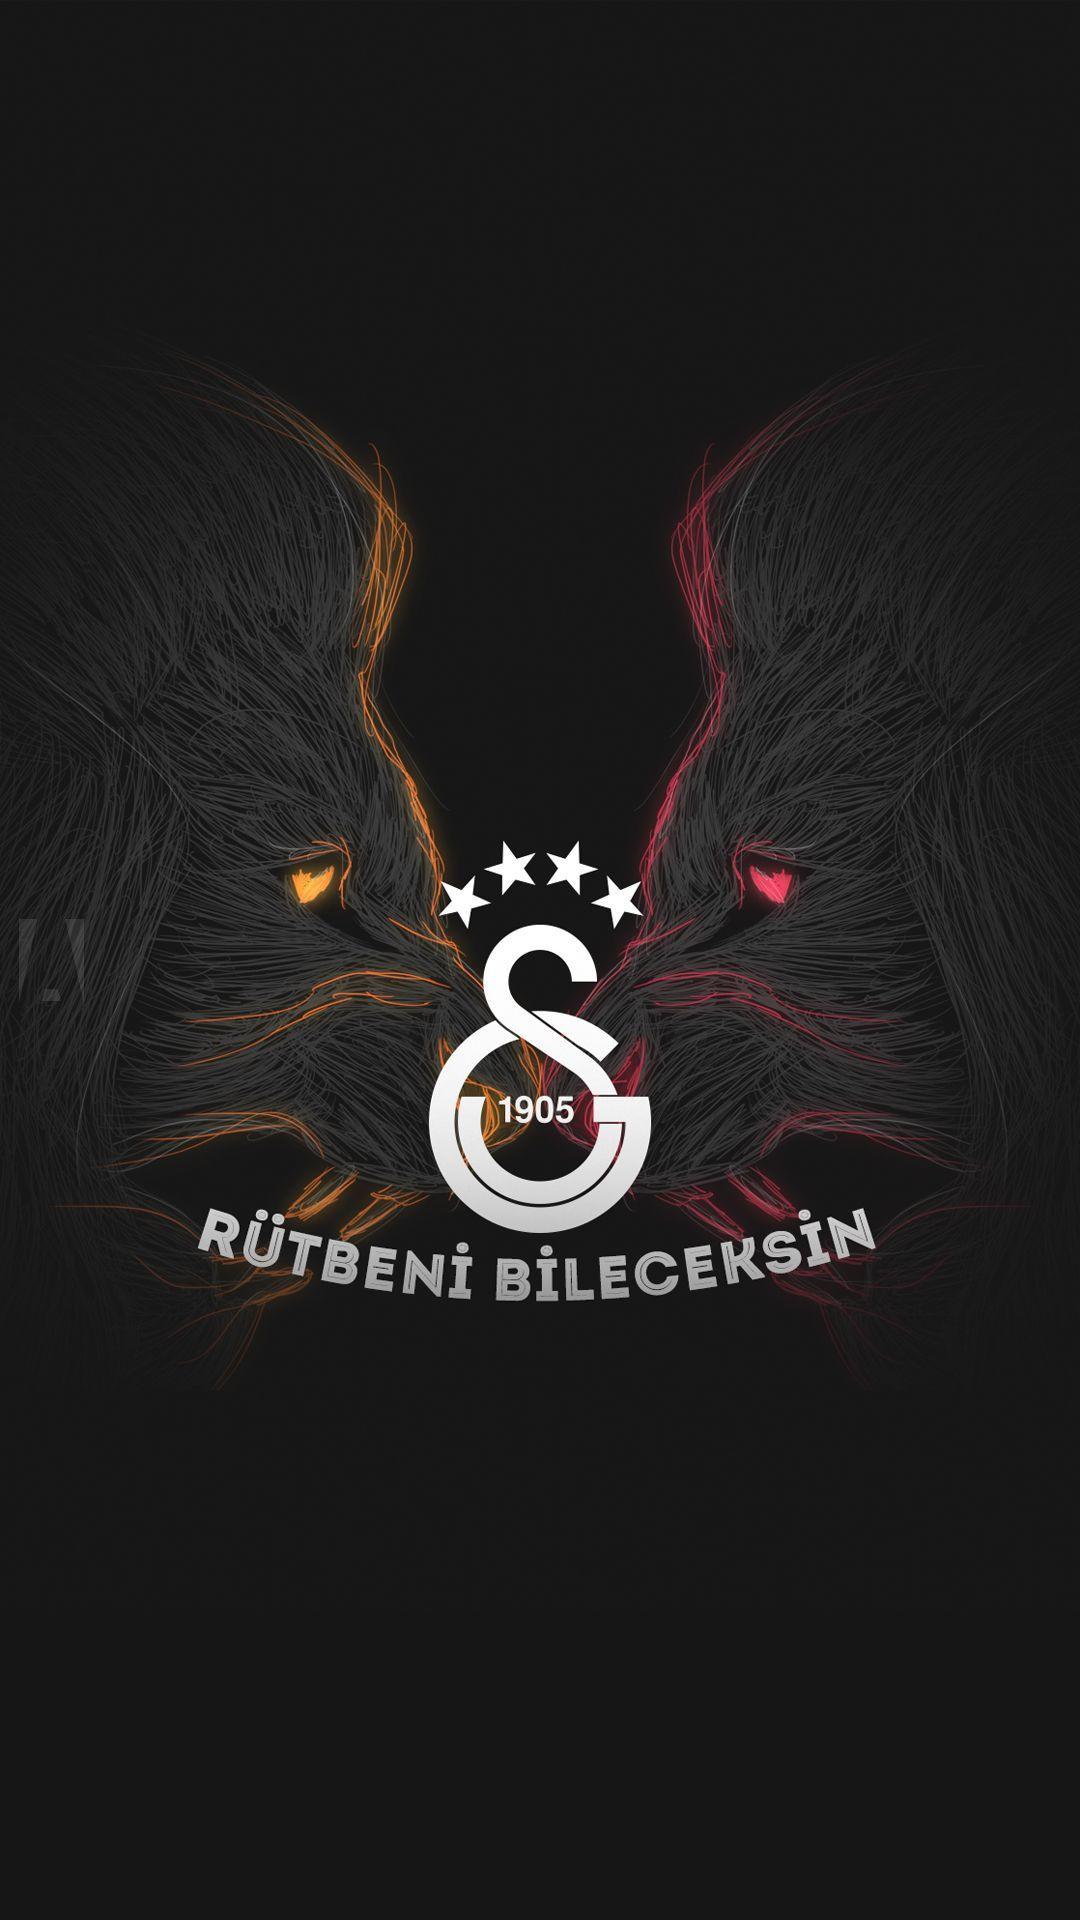 Galatasaray mobil duvar kağıtları! - Page 4